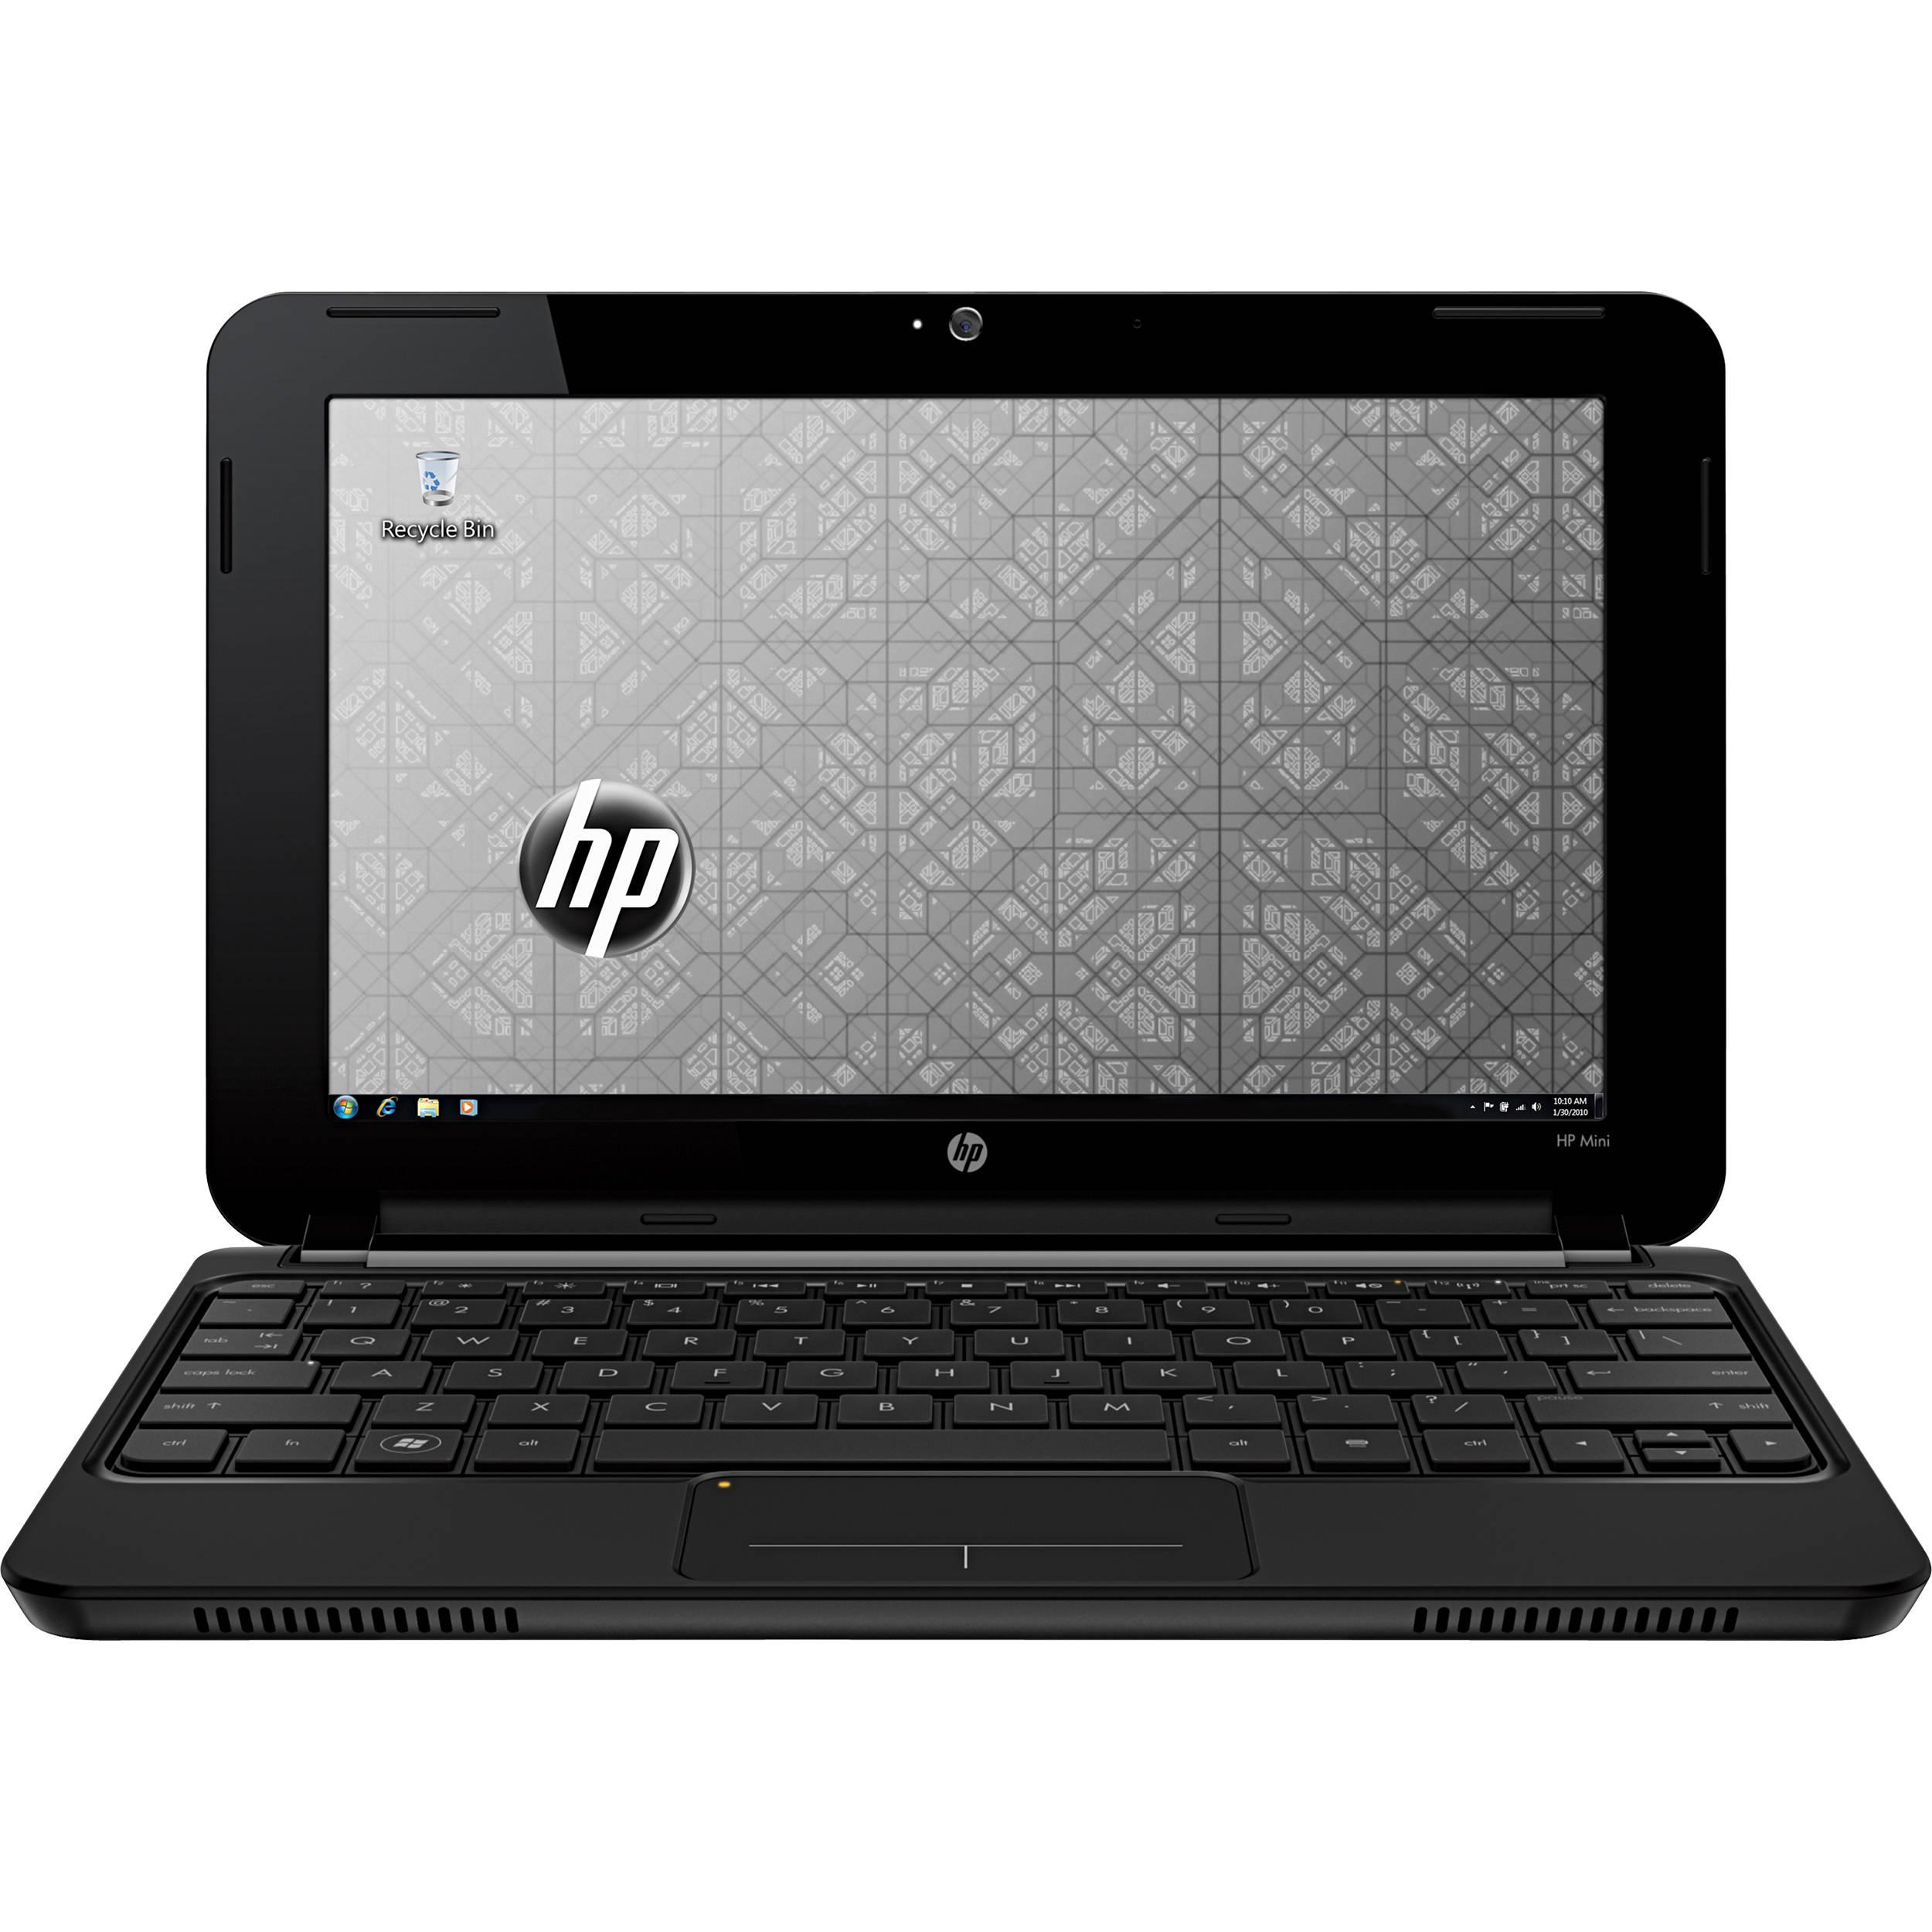 HP Mini 210-1170NR Notebook Webcam Drivers for Windows 10